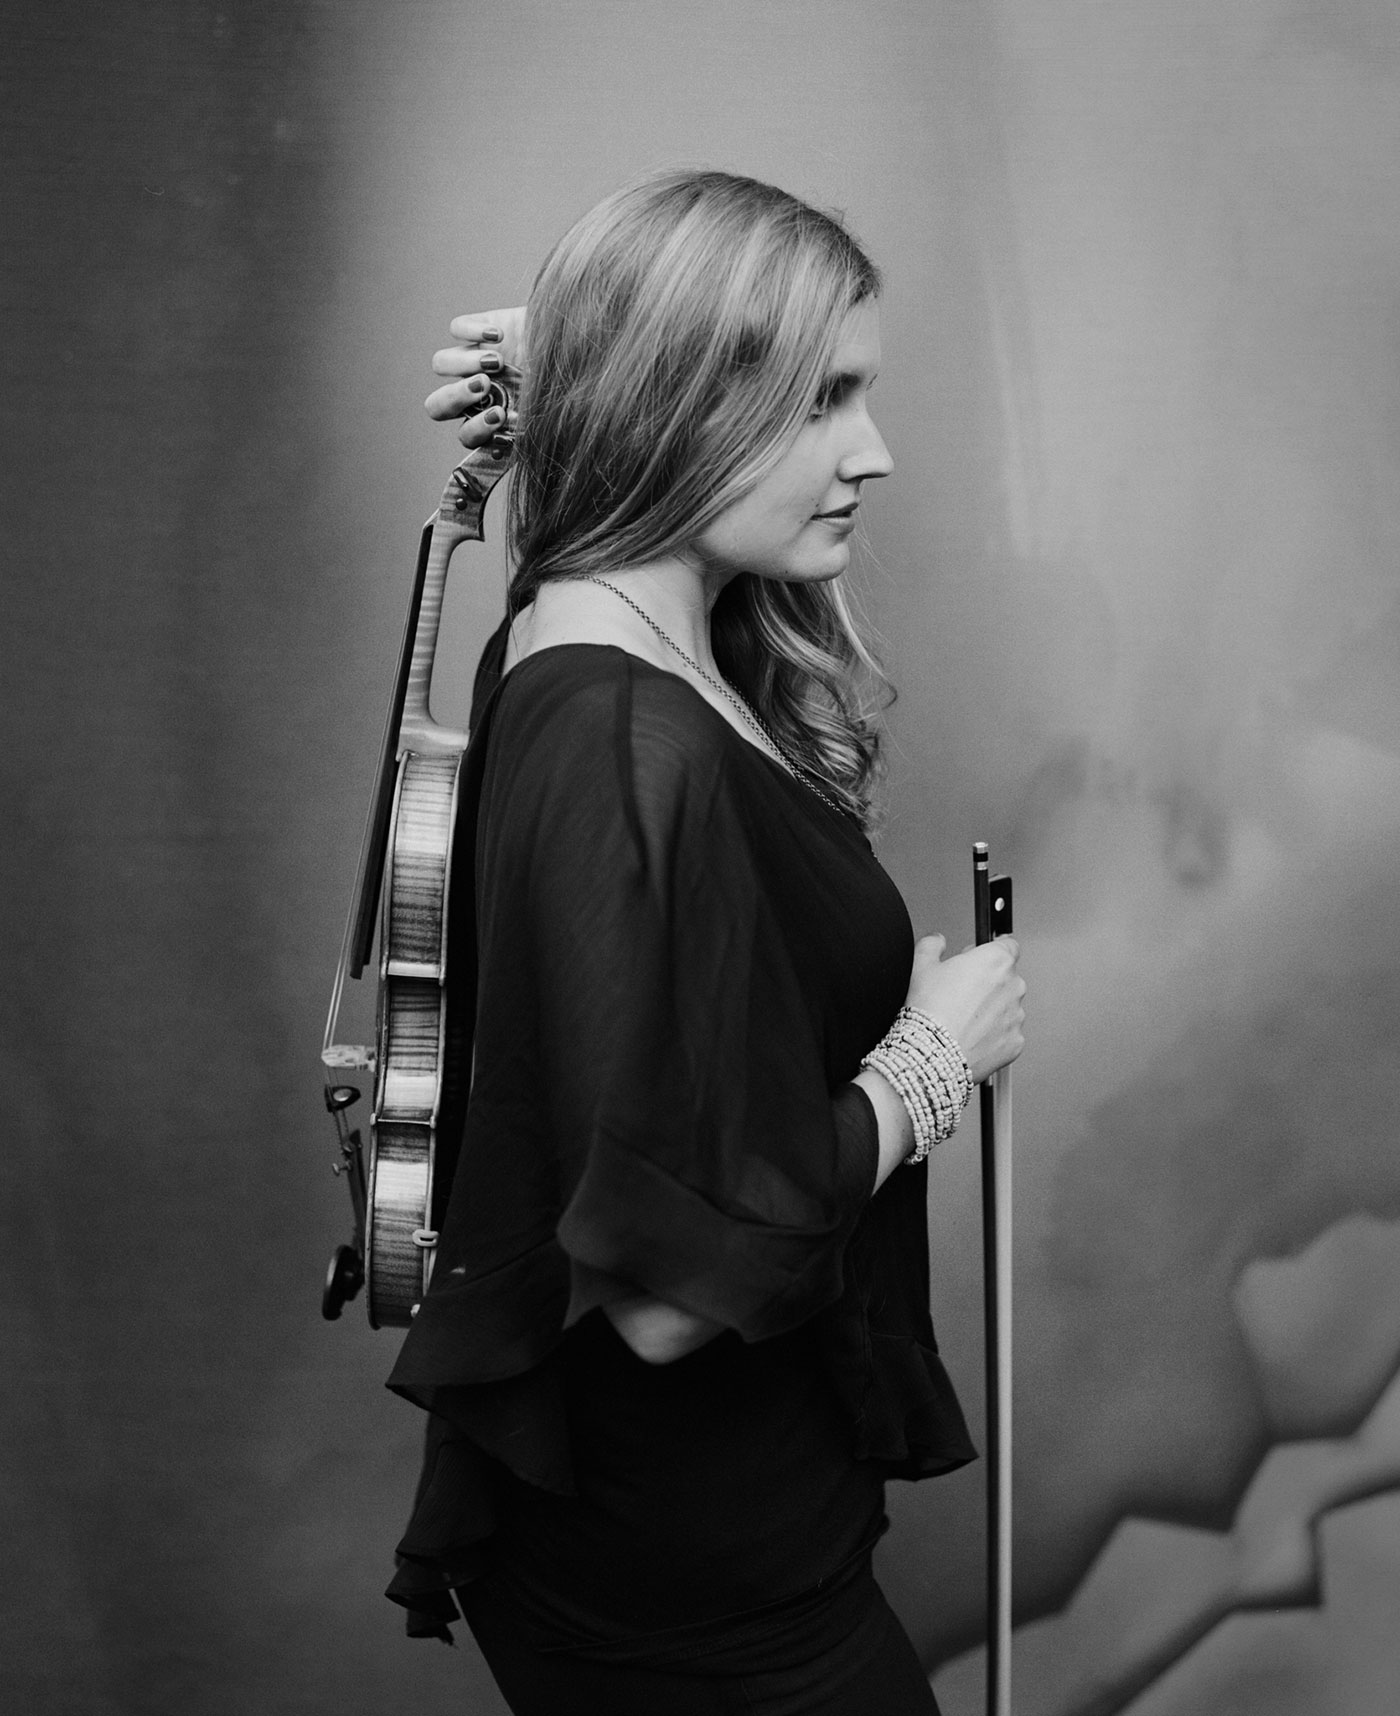 Rachel Nesvig holding a violin behind her back